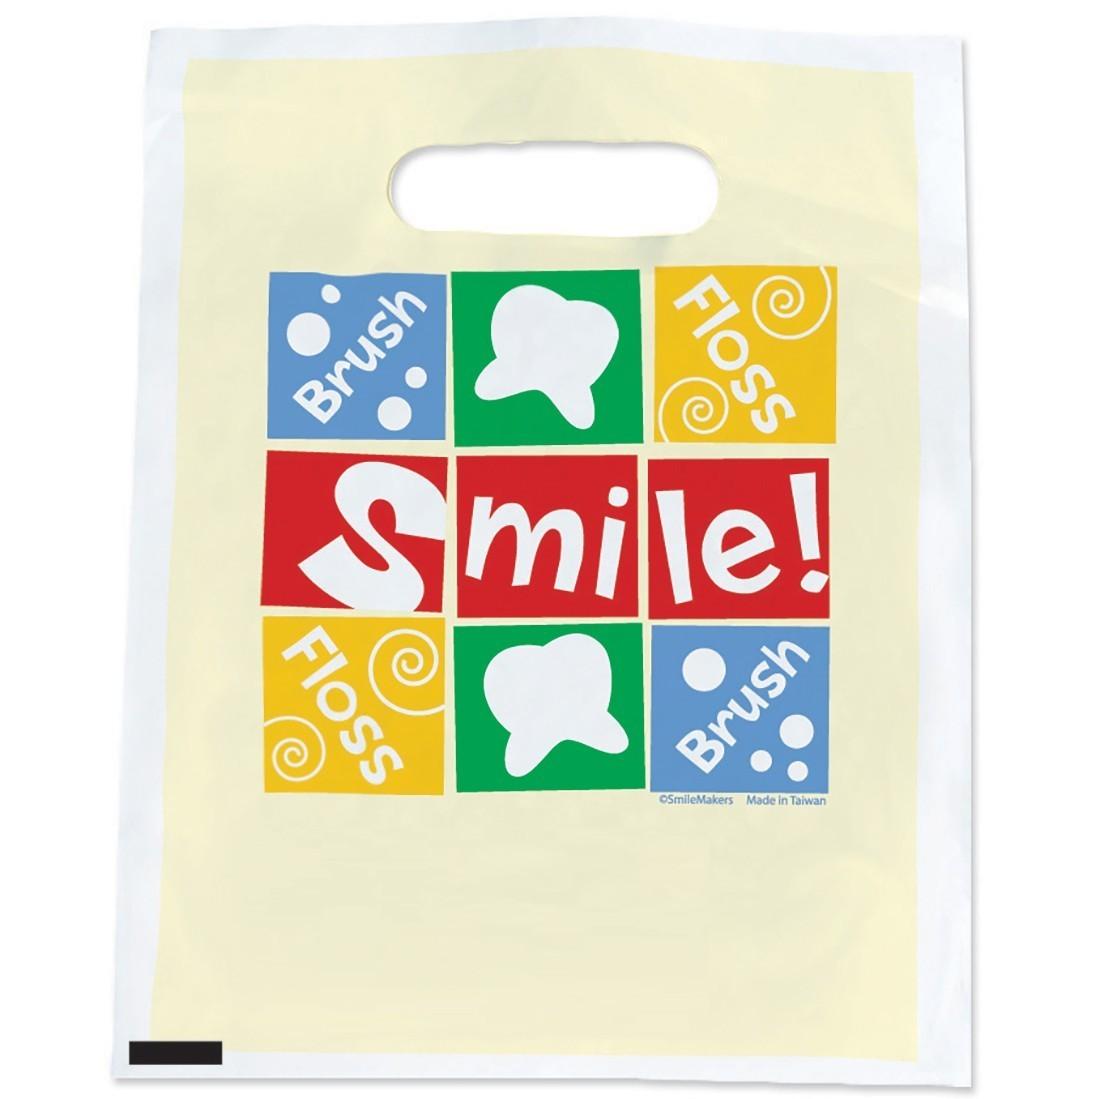 Brush, Floss, Smile Bags                           [image]